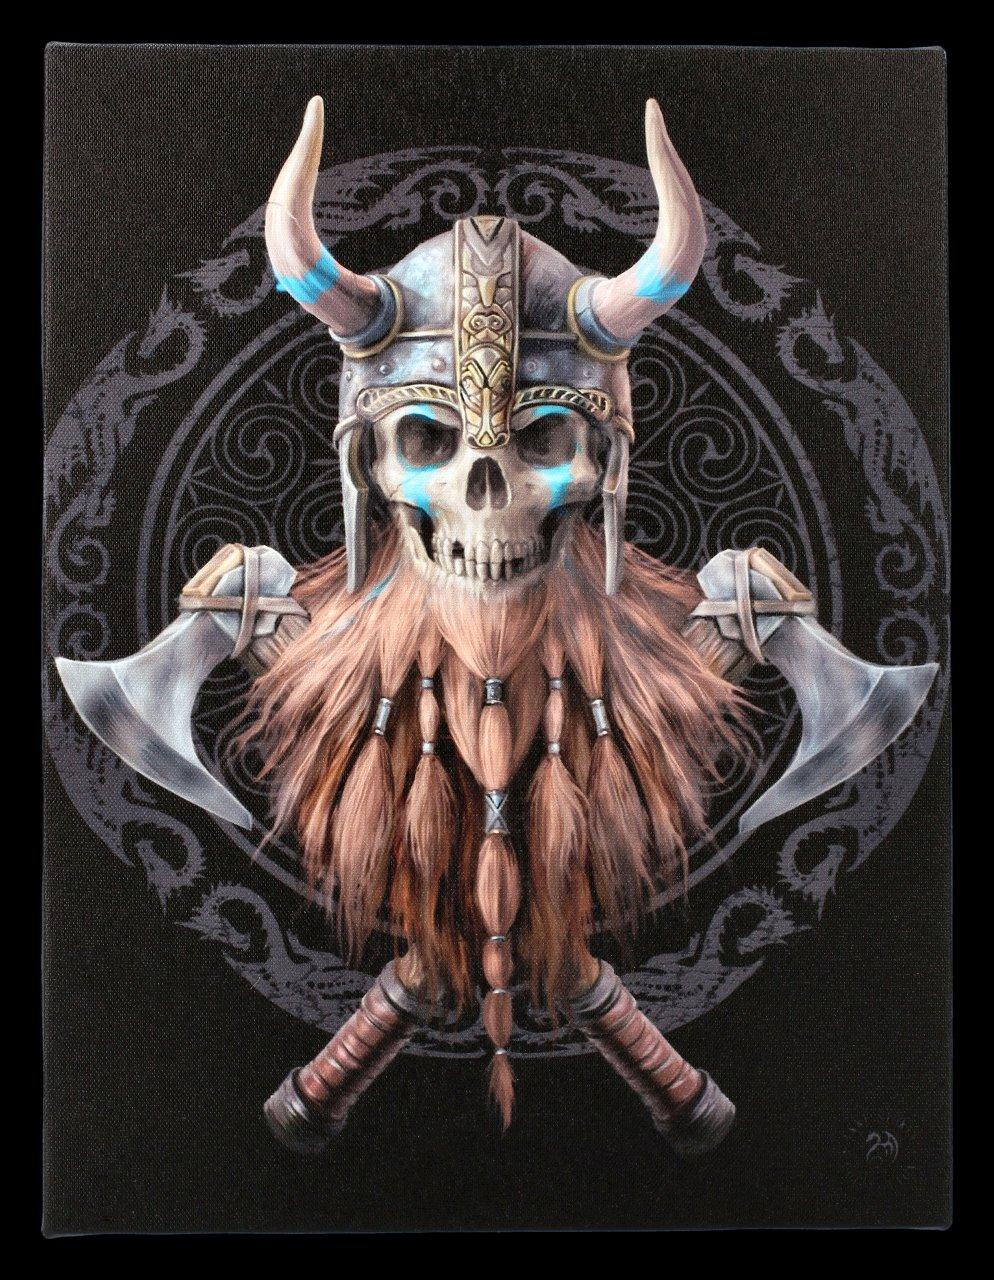 Kleine Leinwand mit Totenkopf - Viking Skull